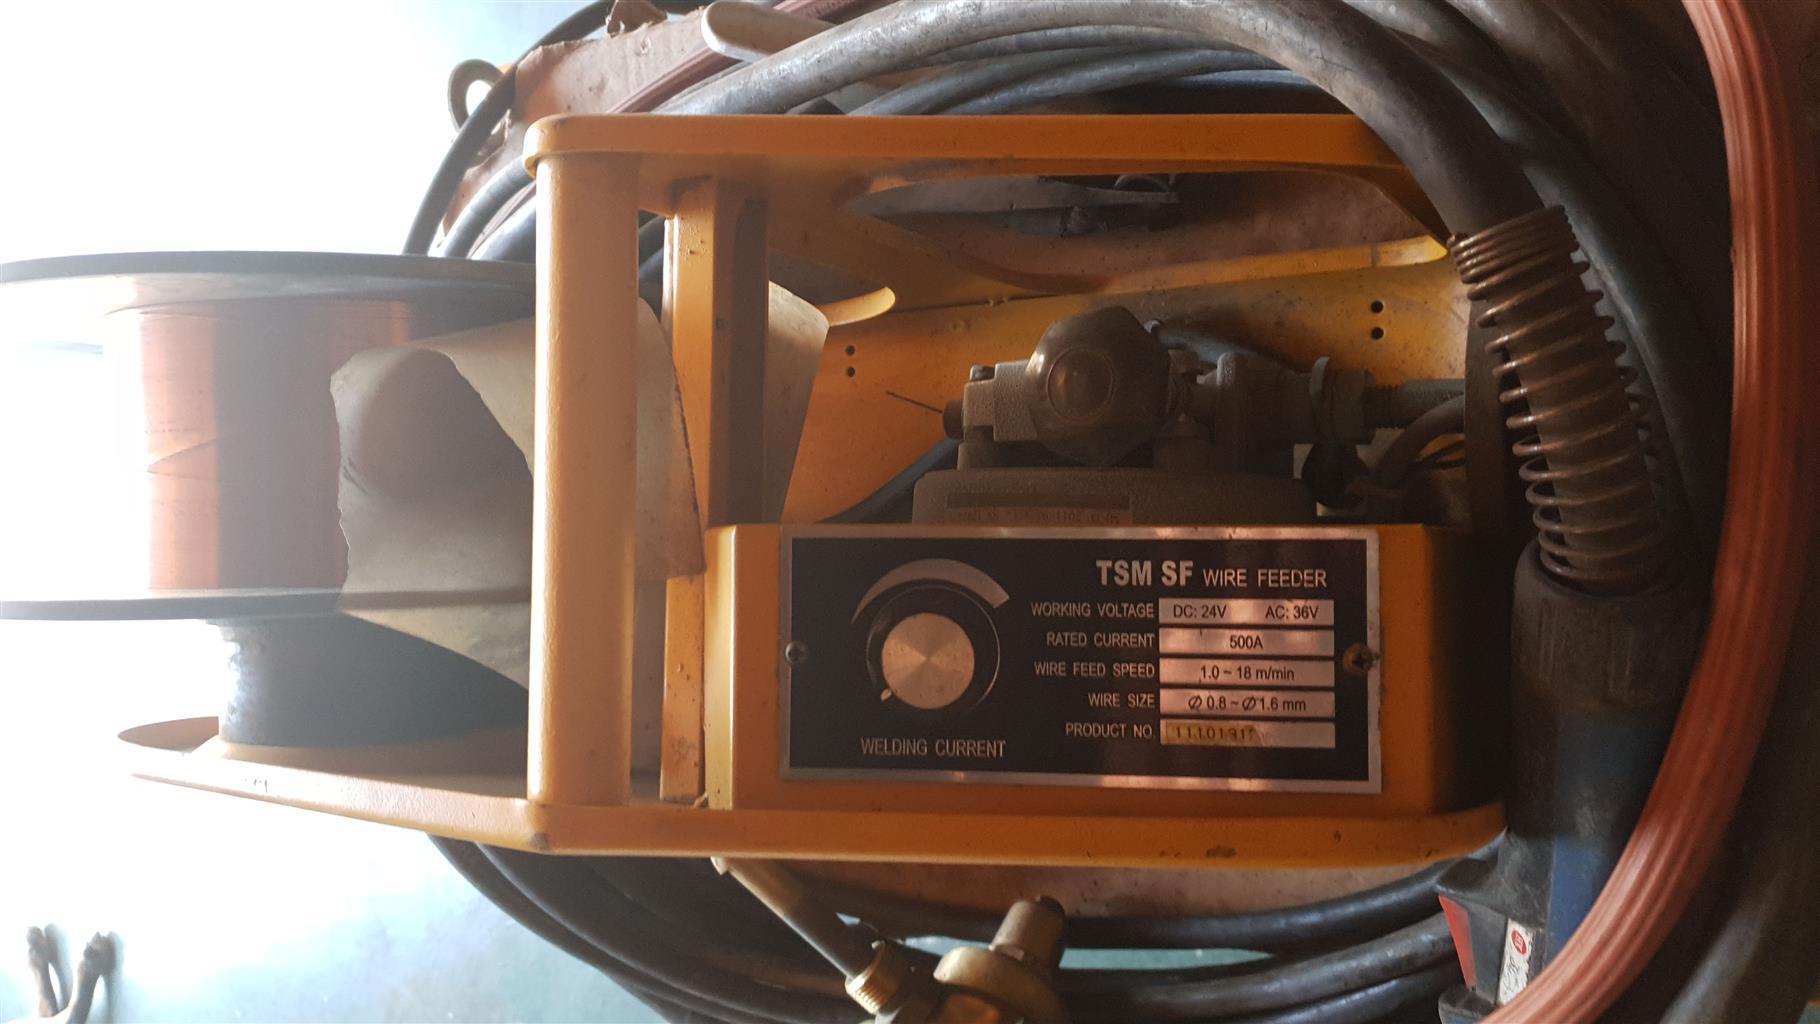 Thermamax Co2 welding machine 380 volt